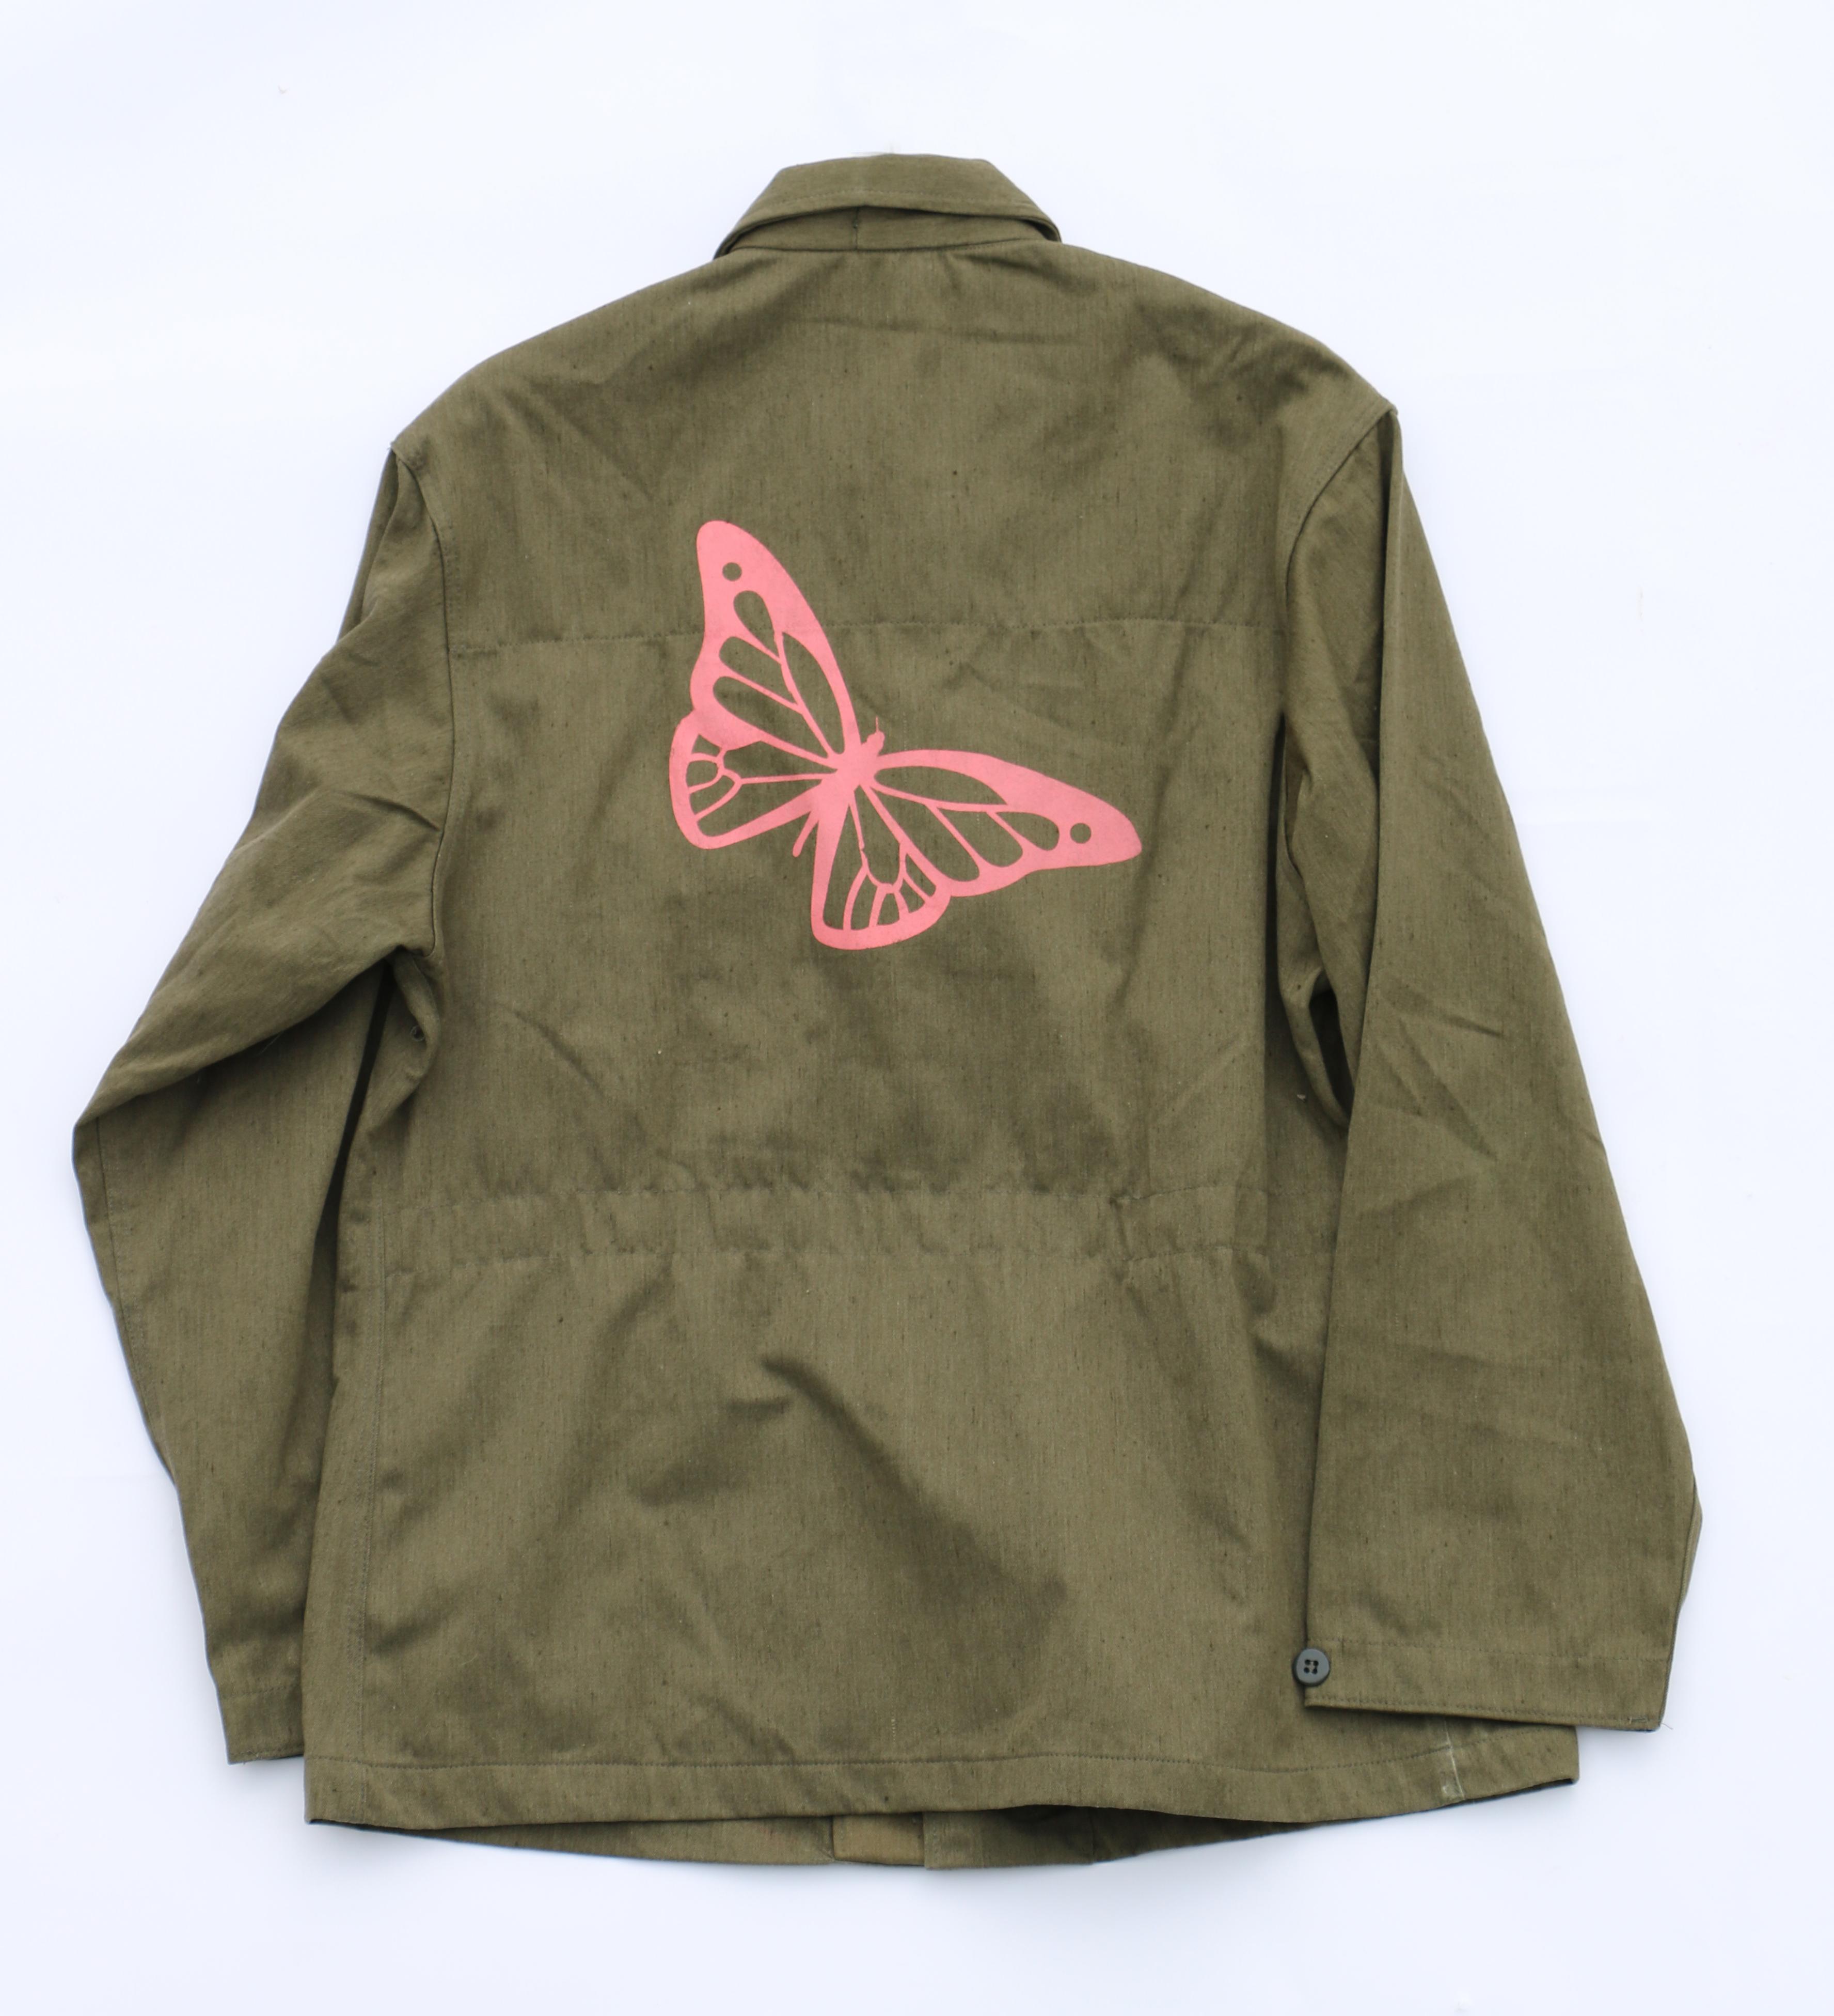 """Ostalgie Fashion"" - Modified Civil Defense Uniform"